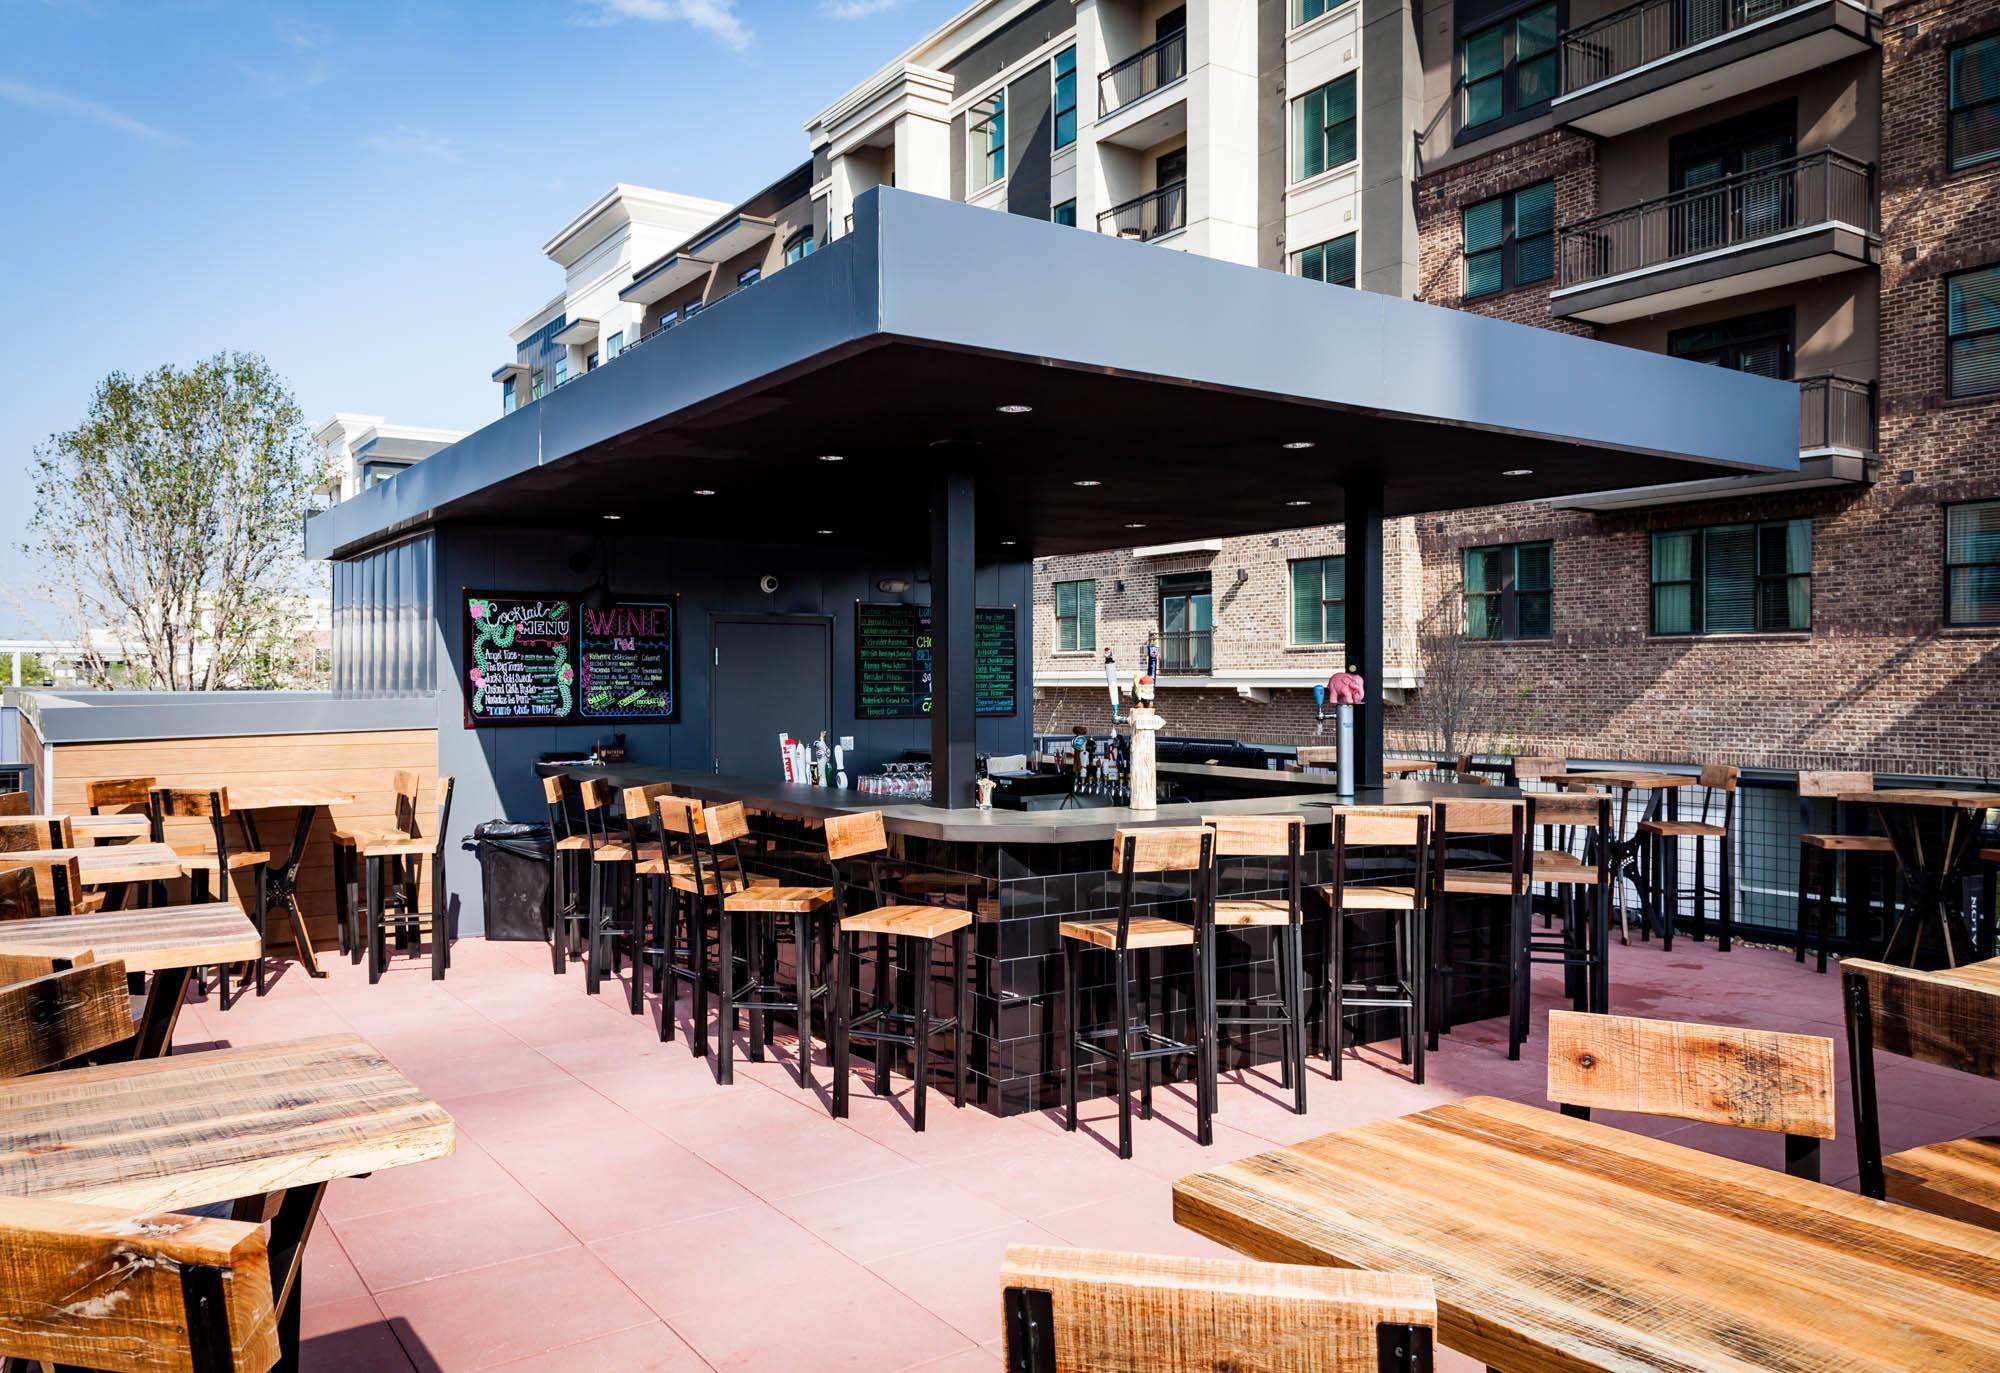 Avalon Alpharetta Ga >> Inside Barleygarden Kitchen & Craft Bar, the Hop City Team's New Avalon Beer Garden - Eater Atlanta